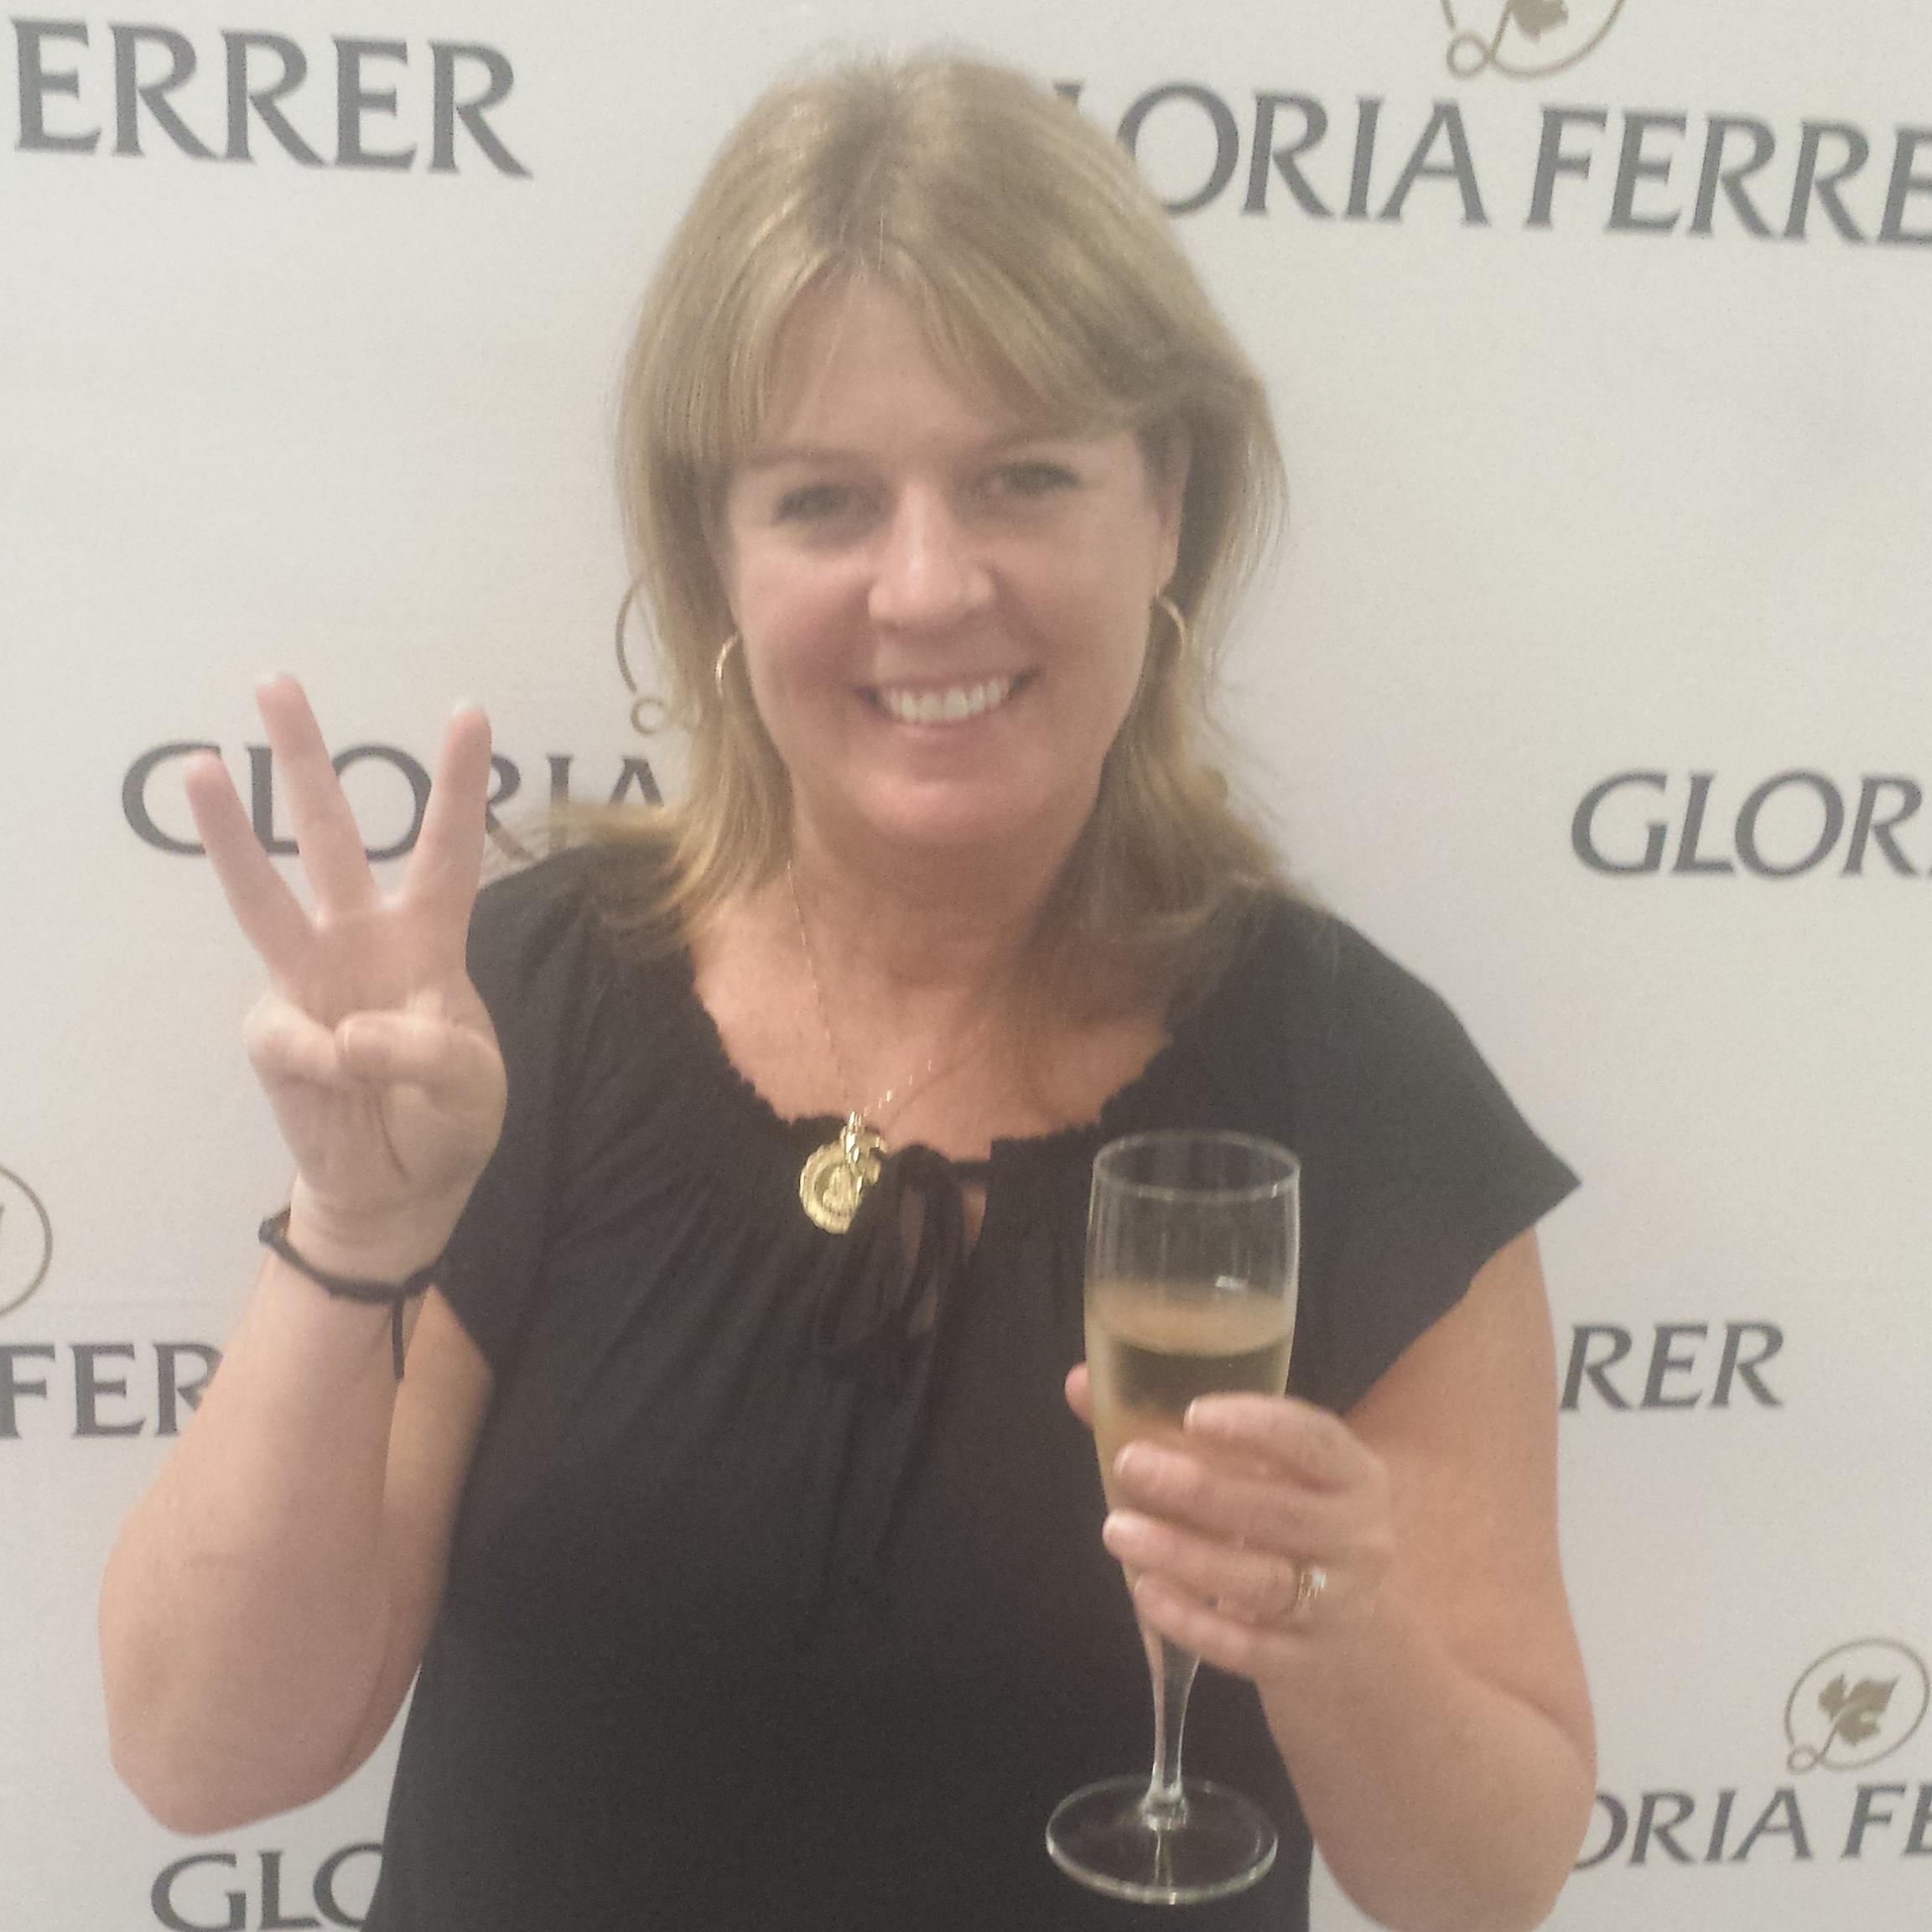 gloria-ferrer-3rd-place